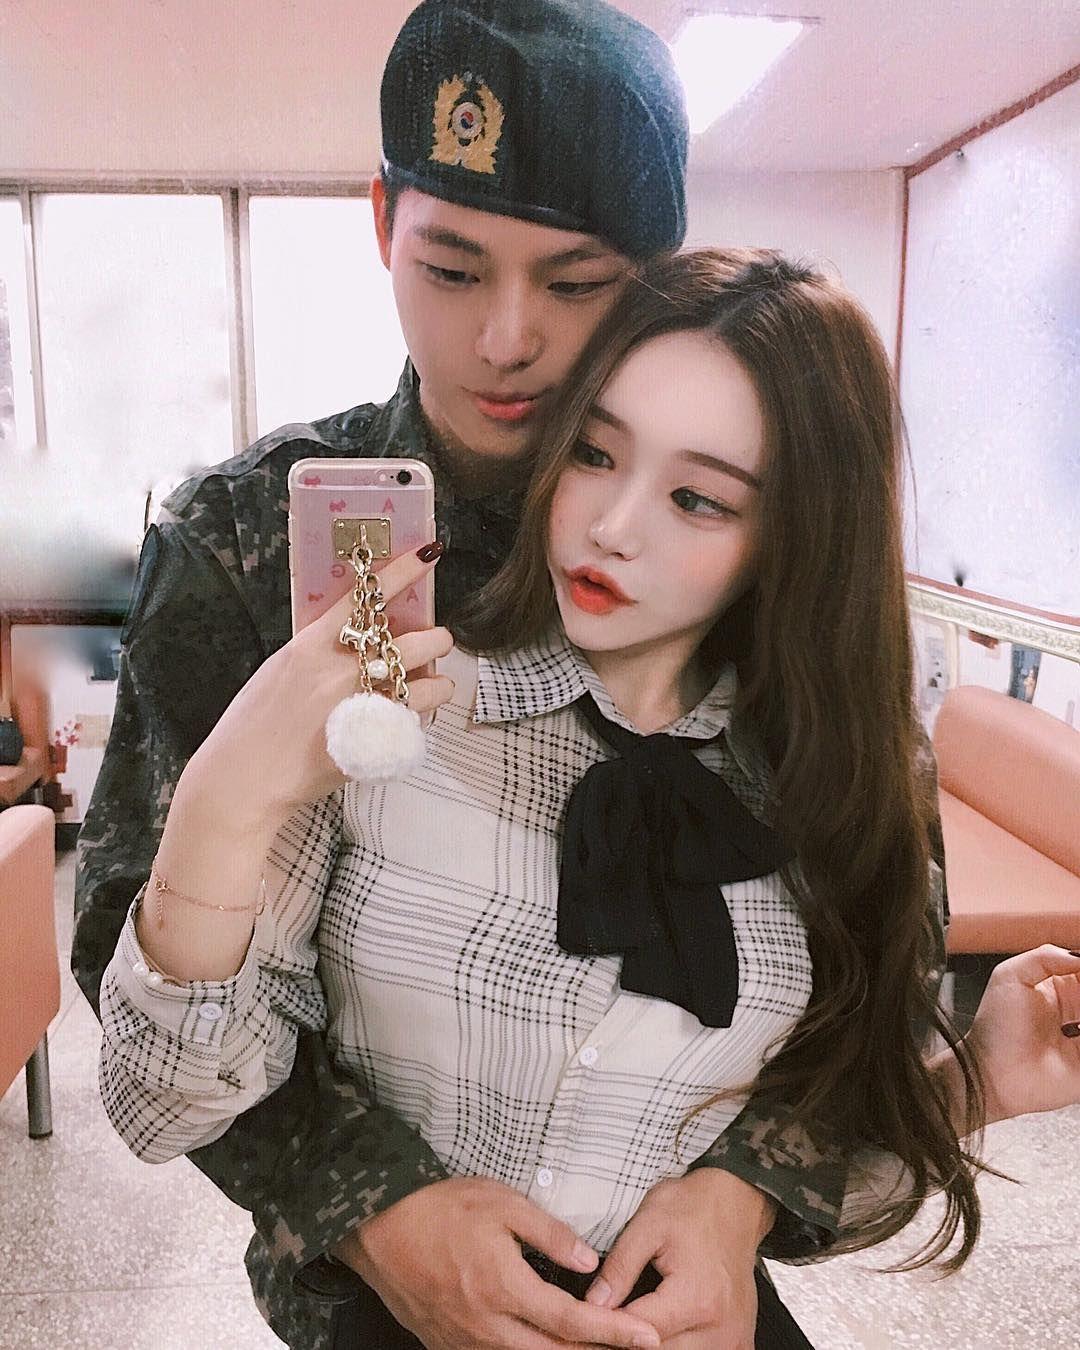 Hd Korsn Movie8 Bath Com: #bemy1ininstagram #koreancouple #ulzzangcouple